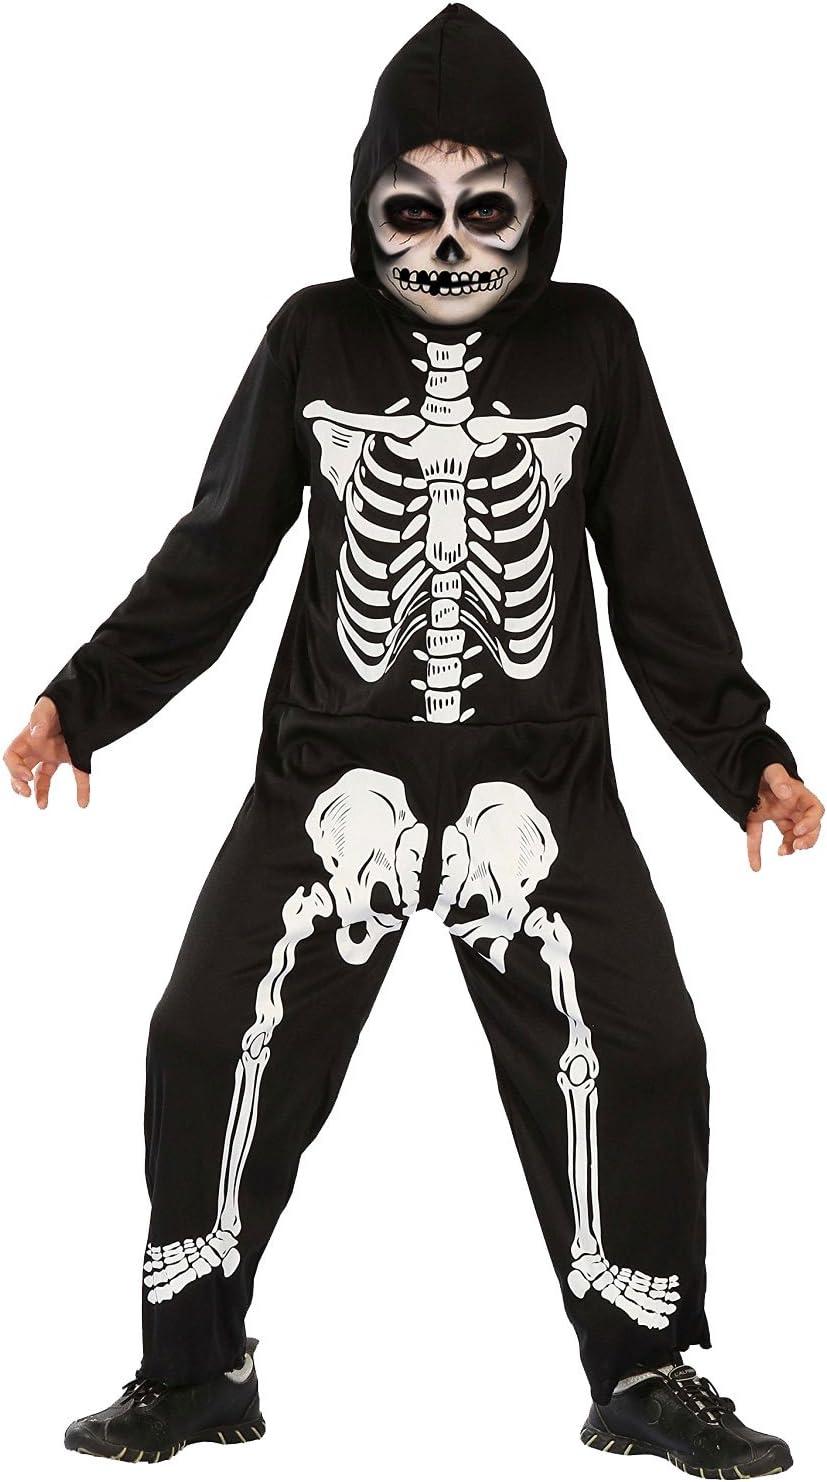 Halloween Kostuem Skelett Amazon.Magicoo Skelett Kostum Kinder Jungen Schwarz Weiss Gruseliges Halloween Kostum Jungen 110 116 Amazon De Spielzeug